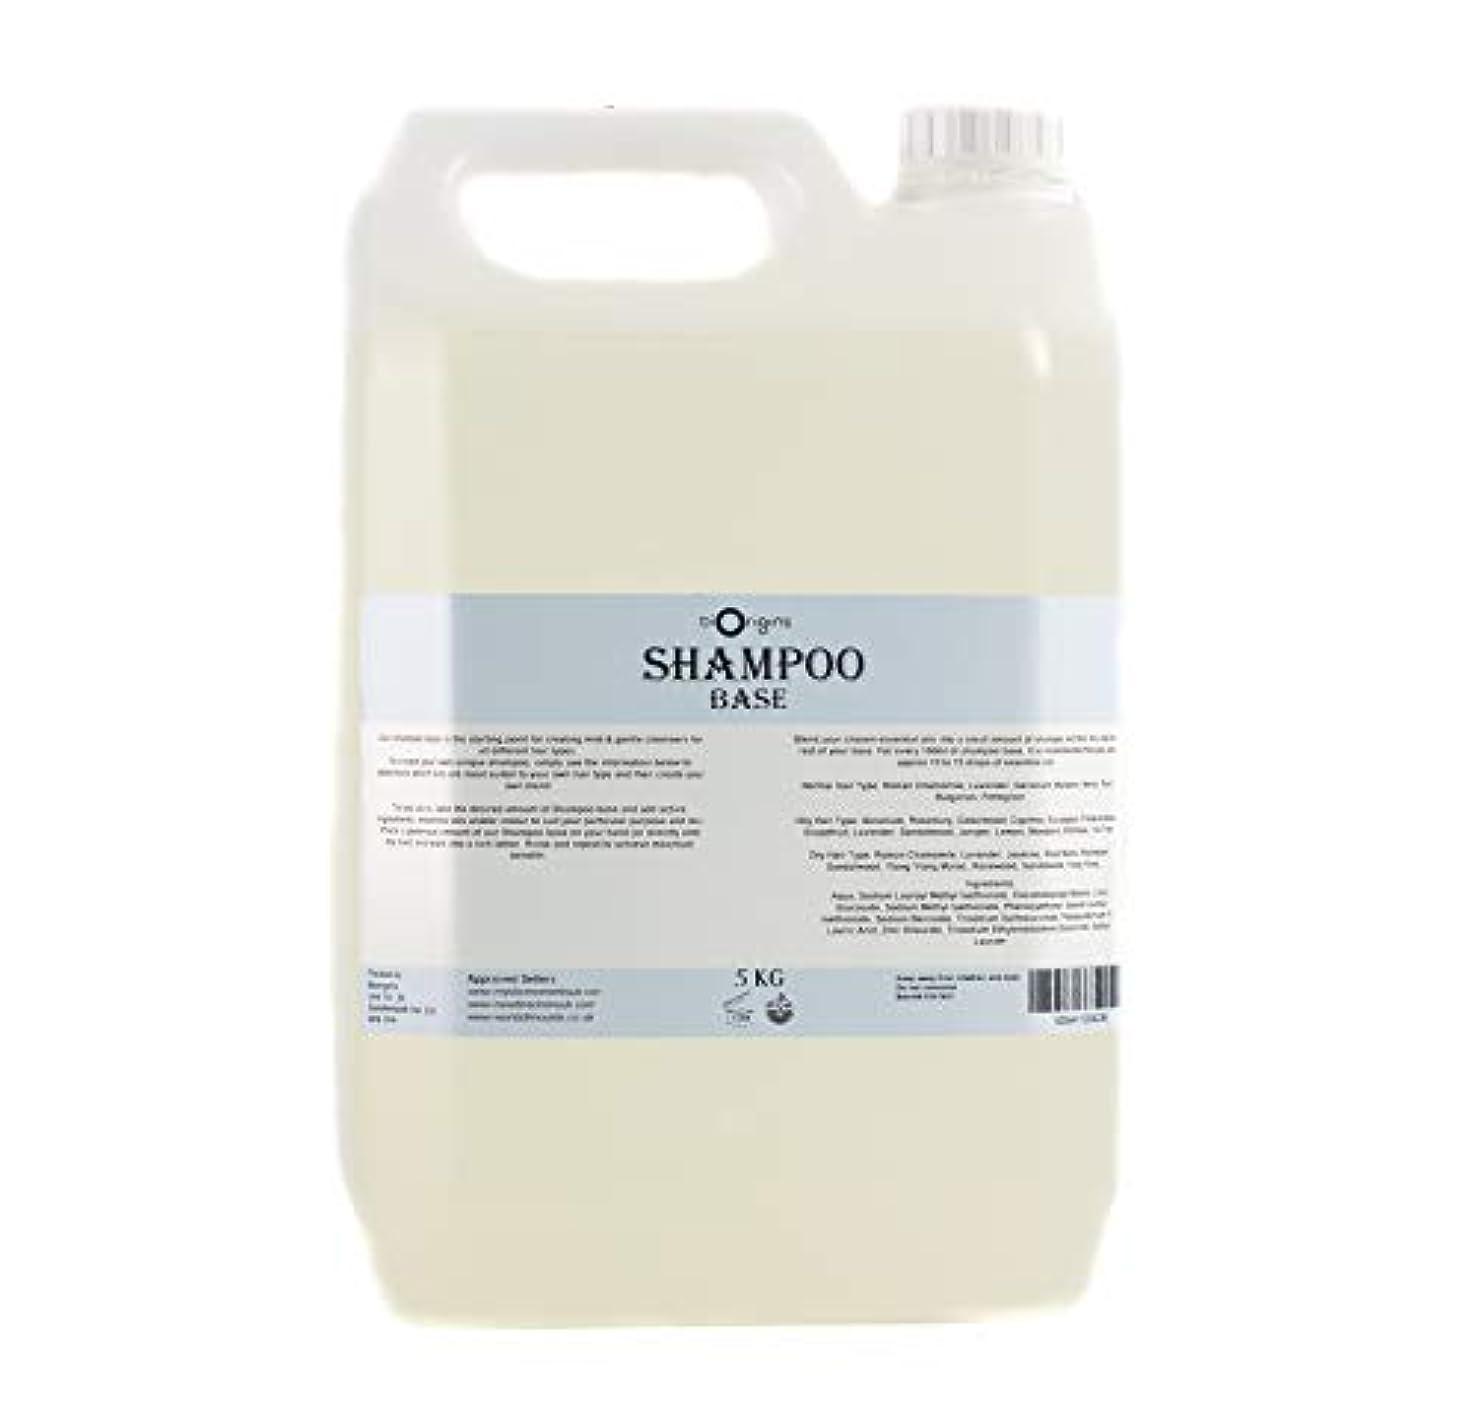 Shampoo Base - 5Kg